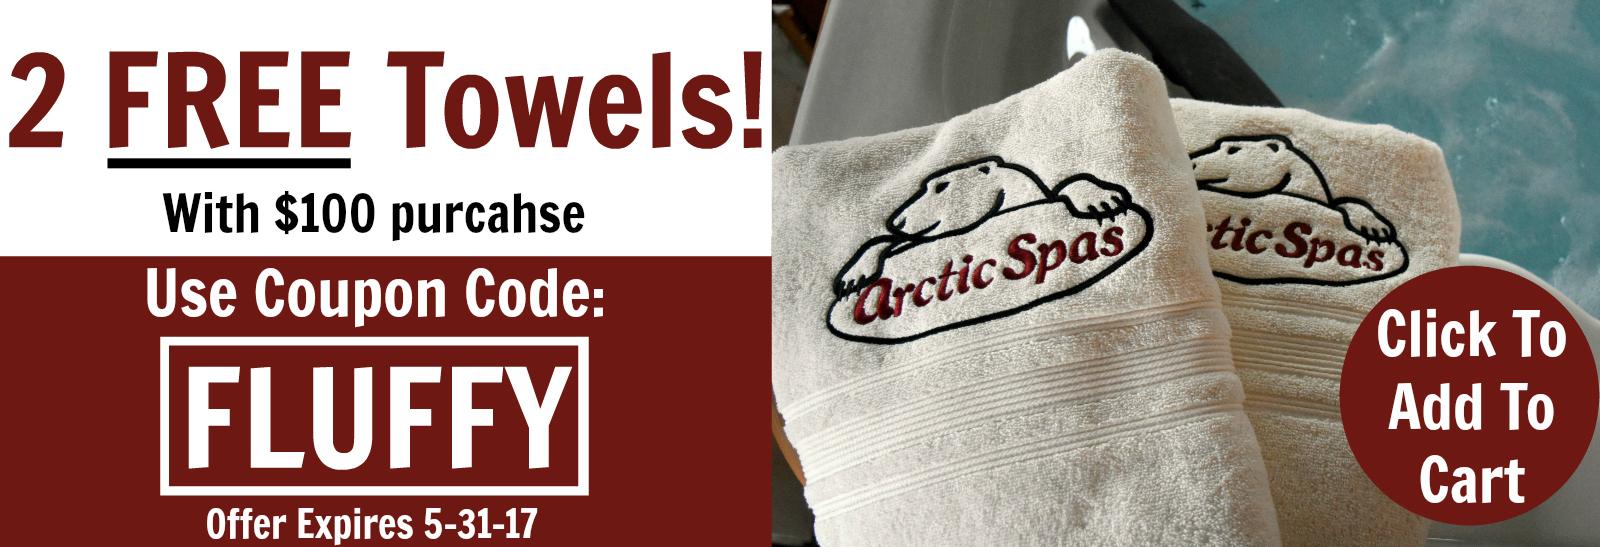 2-free-towels-bannerv3.jpg